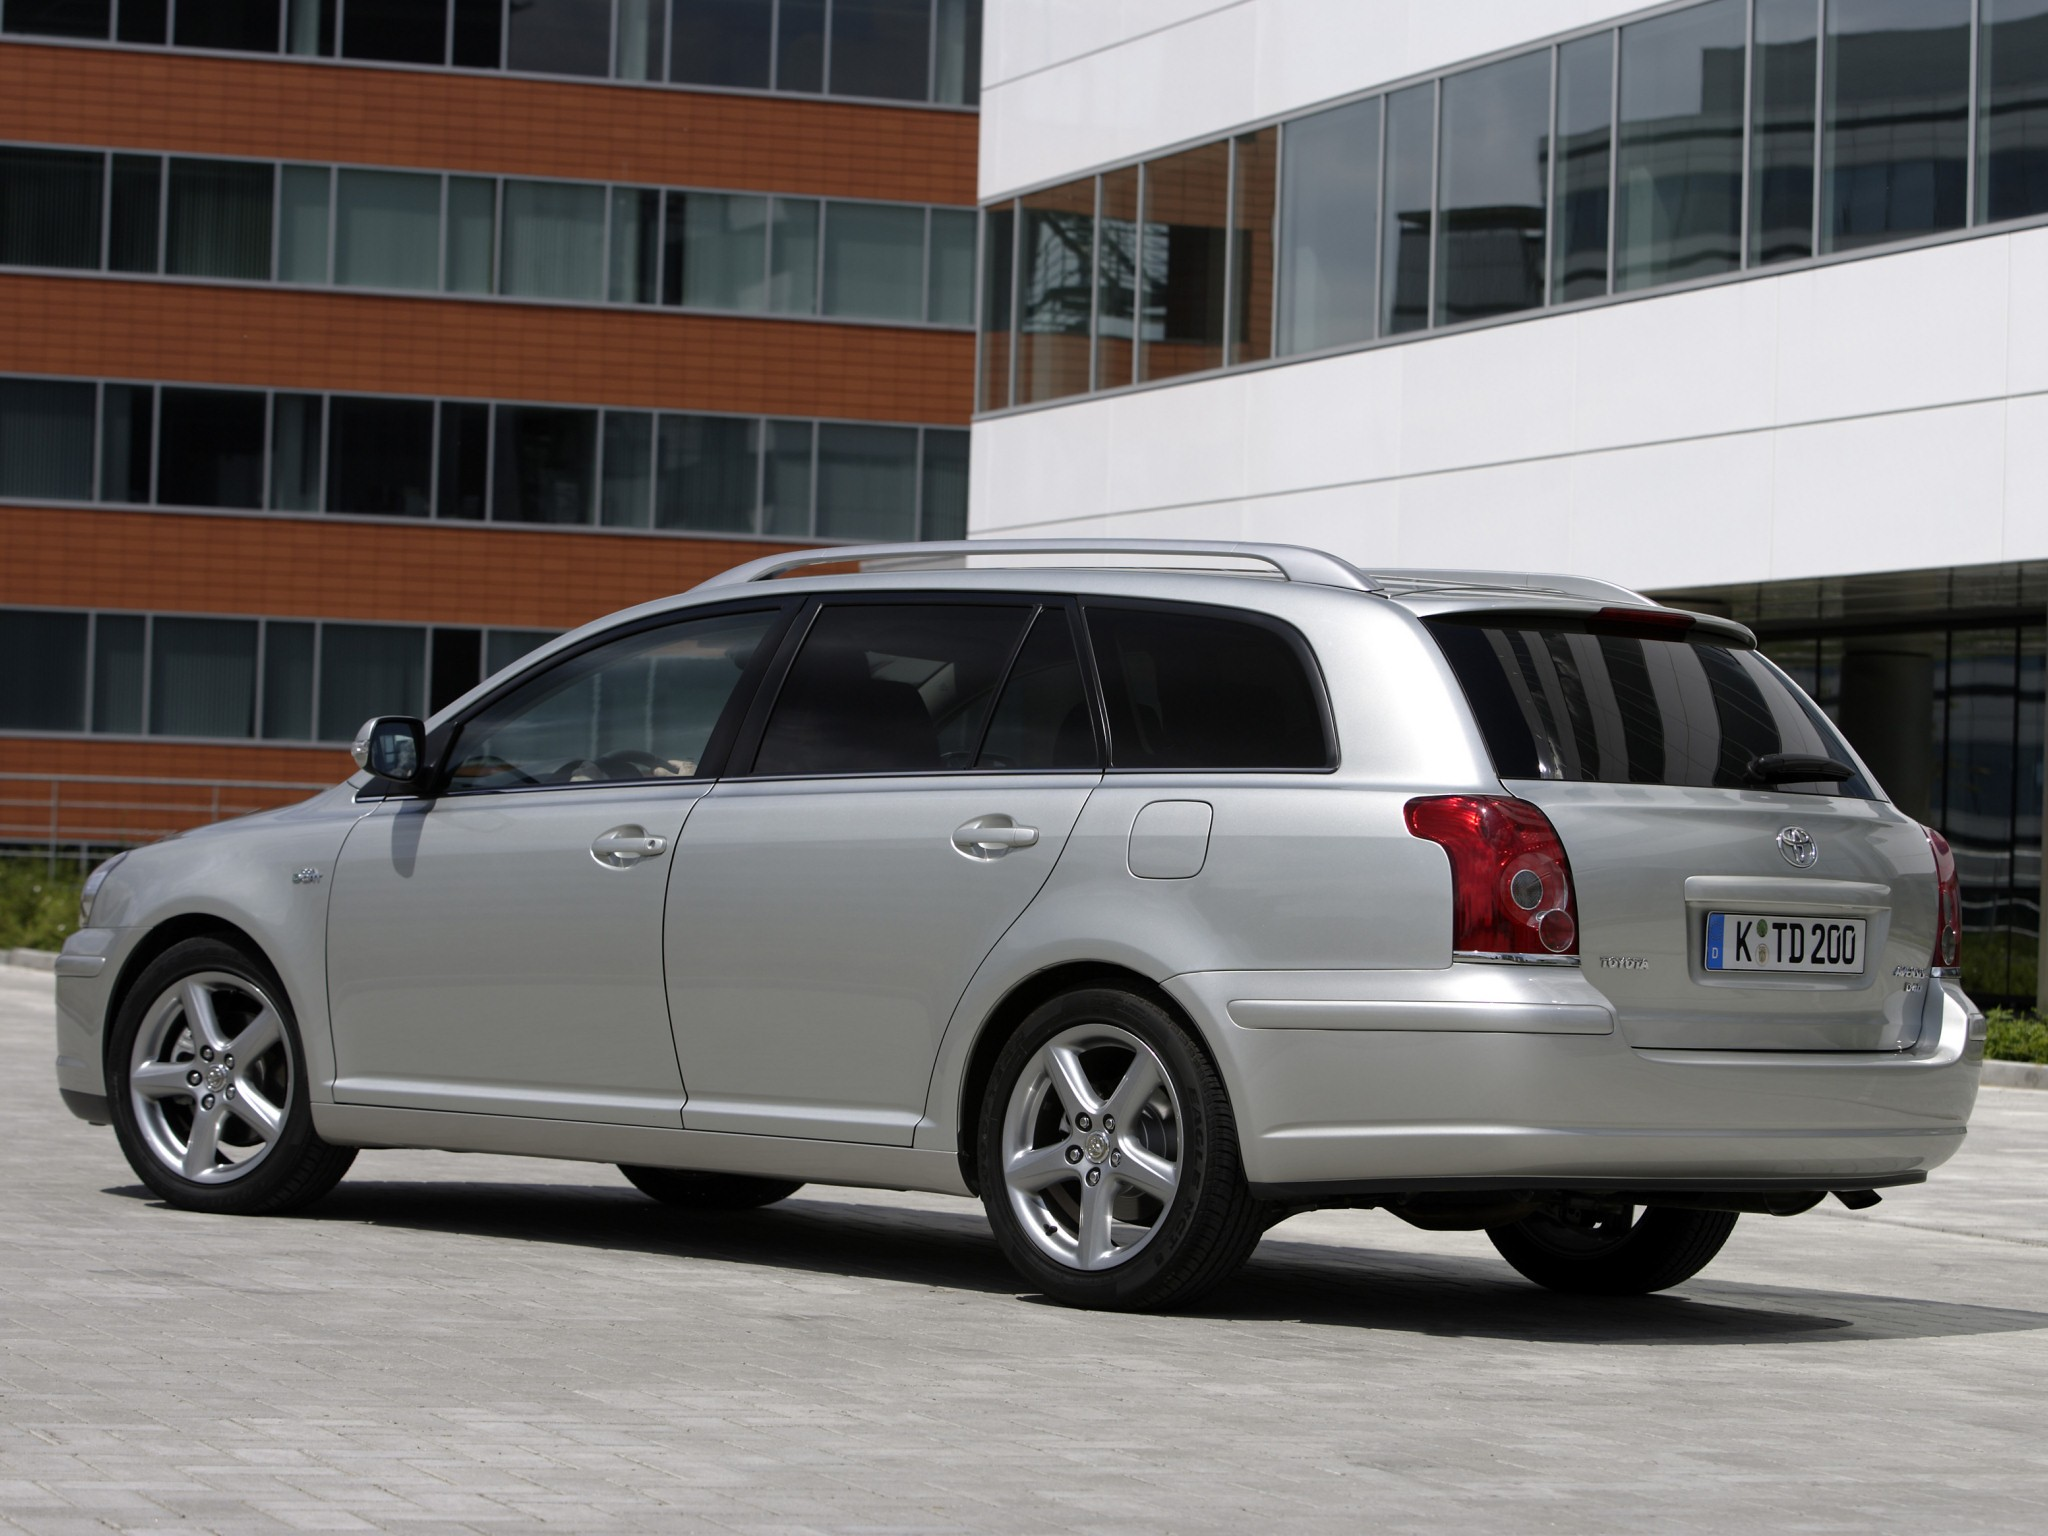 toyota avensis wagon 2006 2007 2008 autoevolution. Black Bedroom Furniture Sets. Home Design Ideas